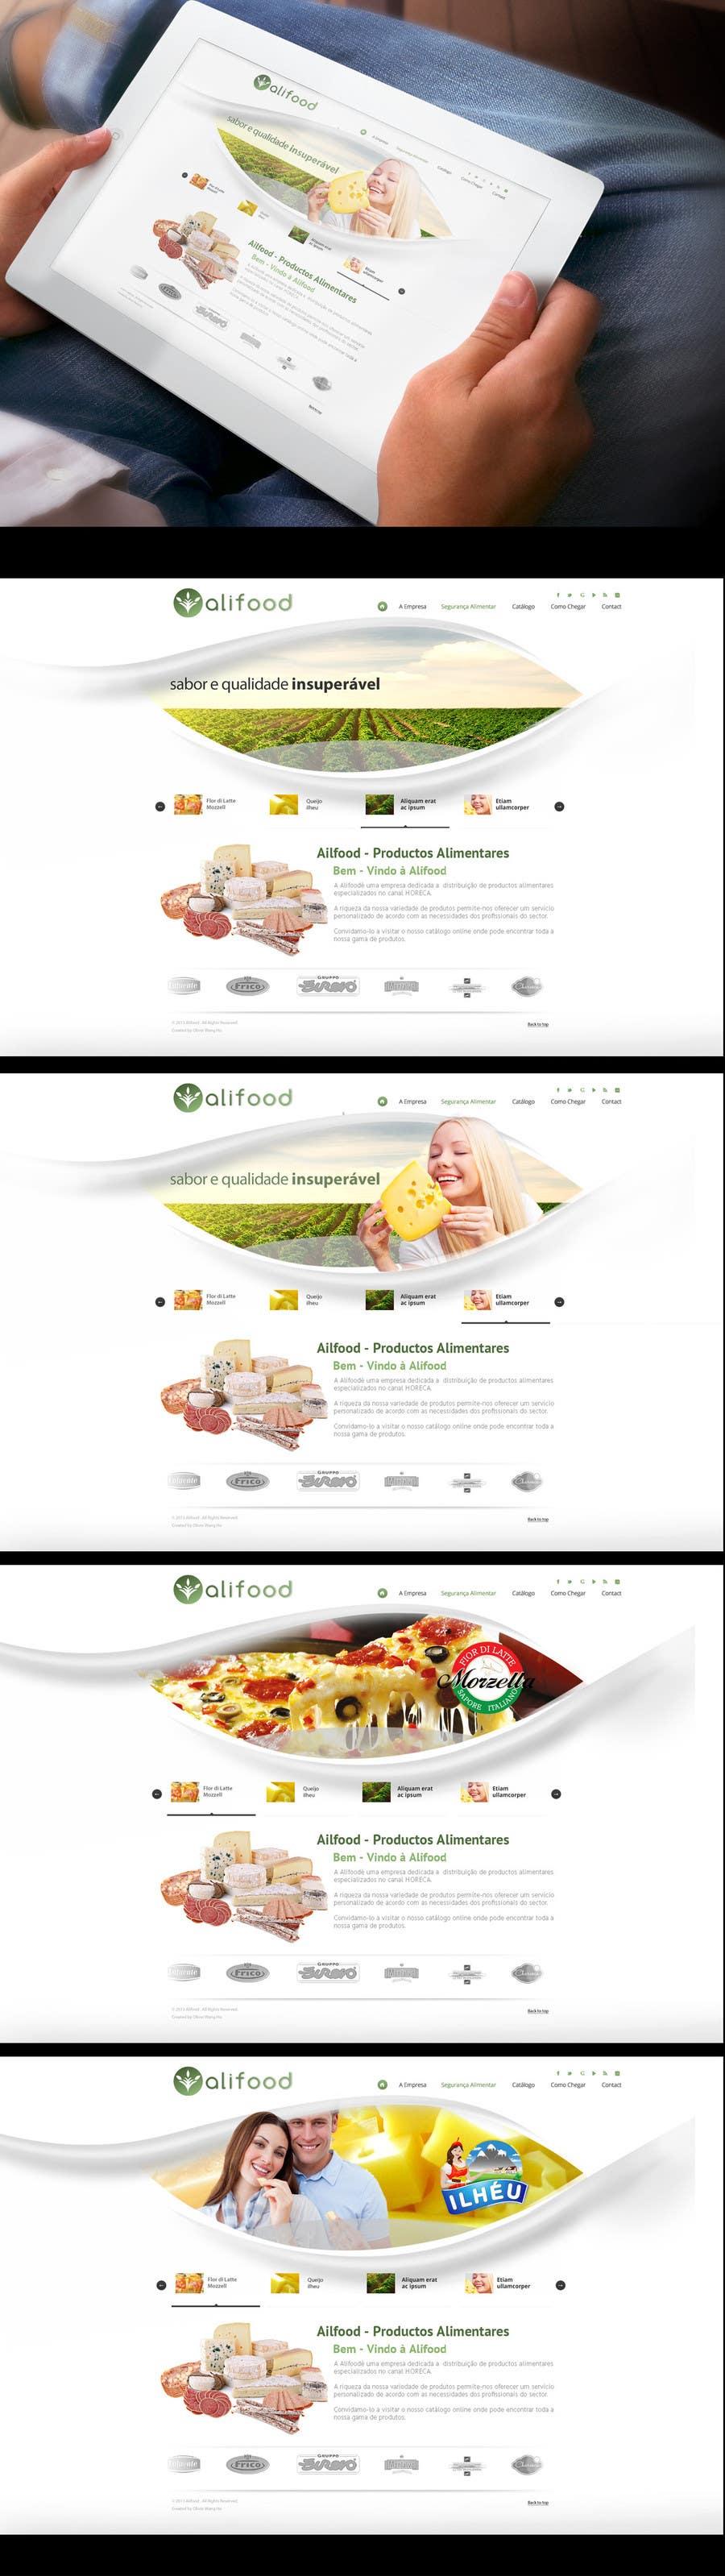 Bài tham dự cuộc thi #5 cho Website Design for www.alifood.pt